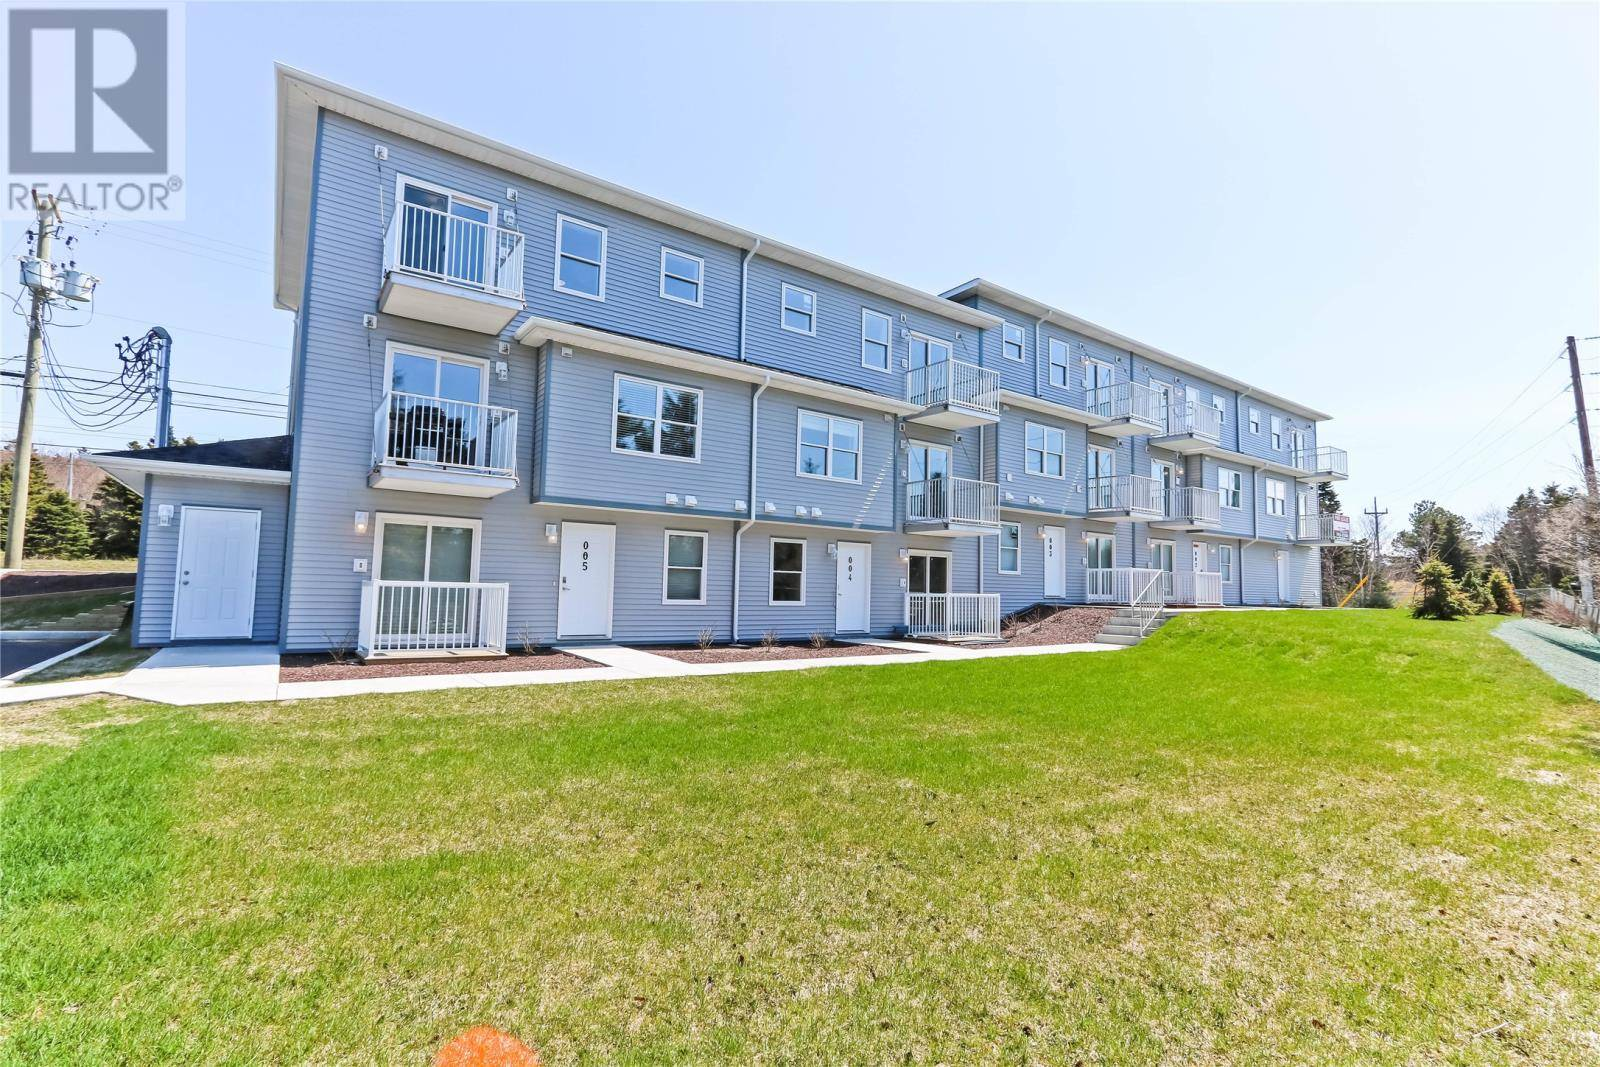 House for sale at 56 Bay Bulls Rd Unit 204 St. John's Newfoundland - MLS: 1200773